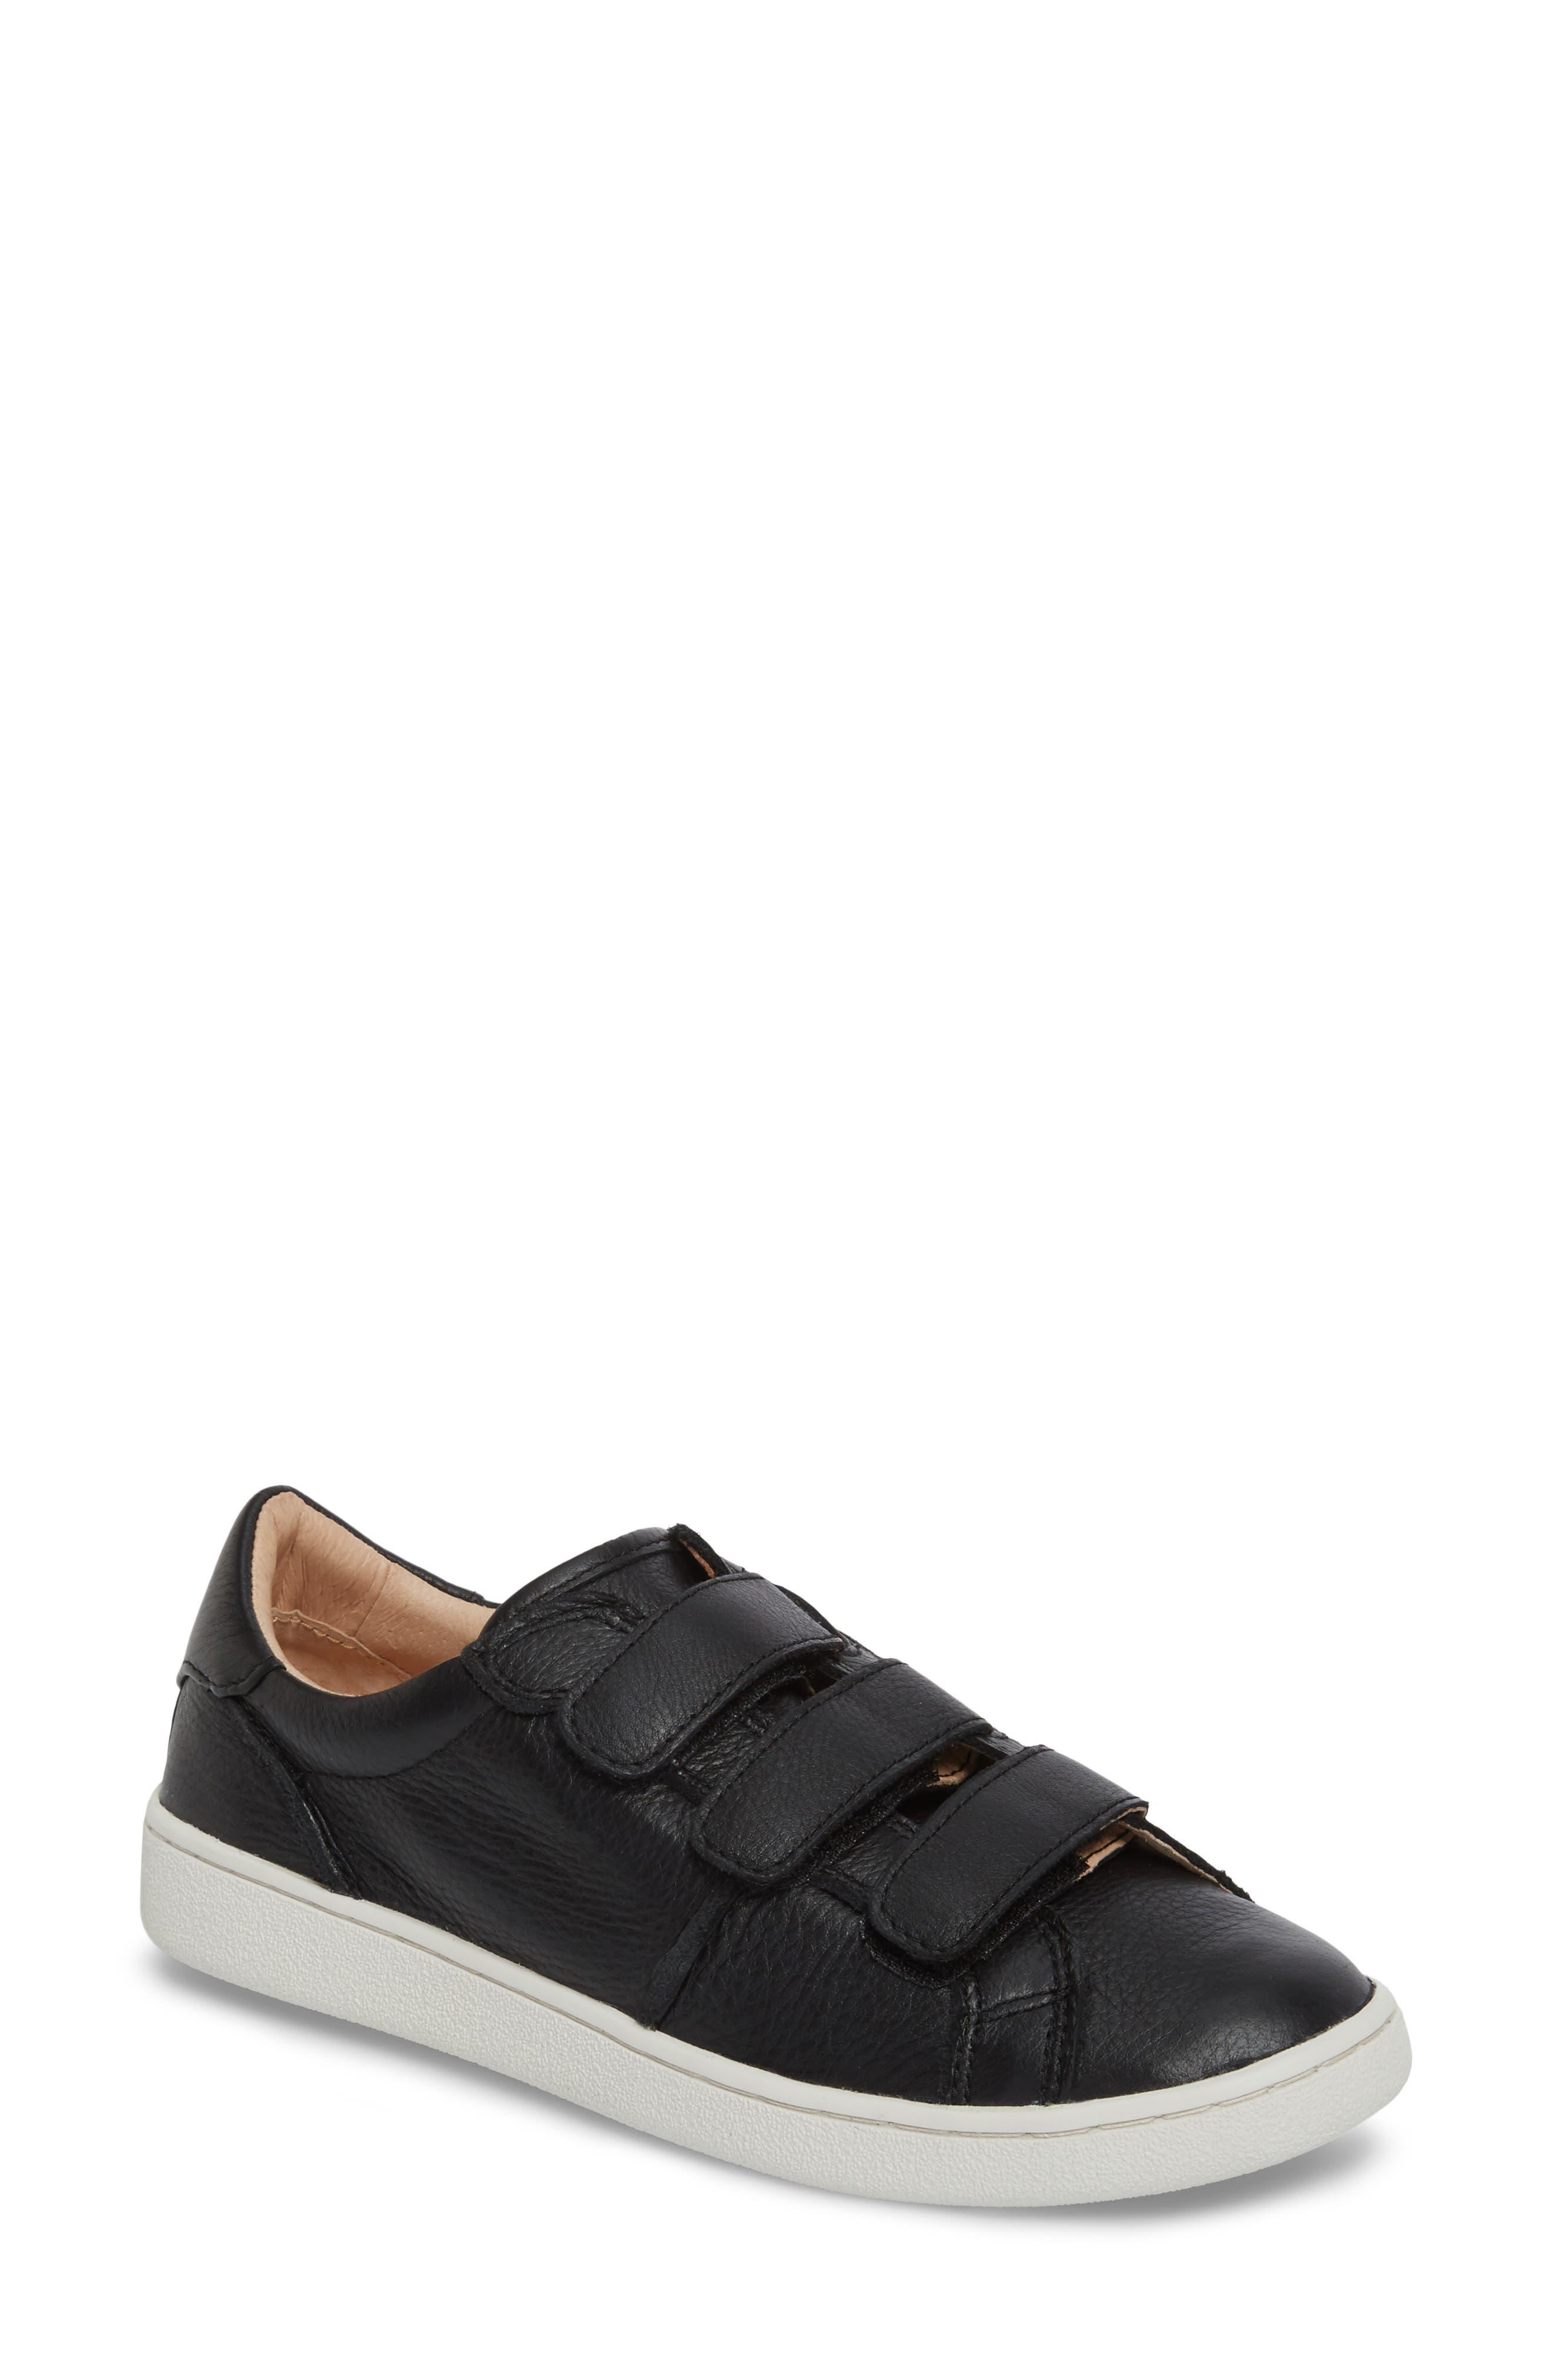 UGG<SUP>®</SUP> Alix Sneaker, Main, color, 001